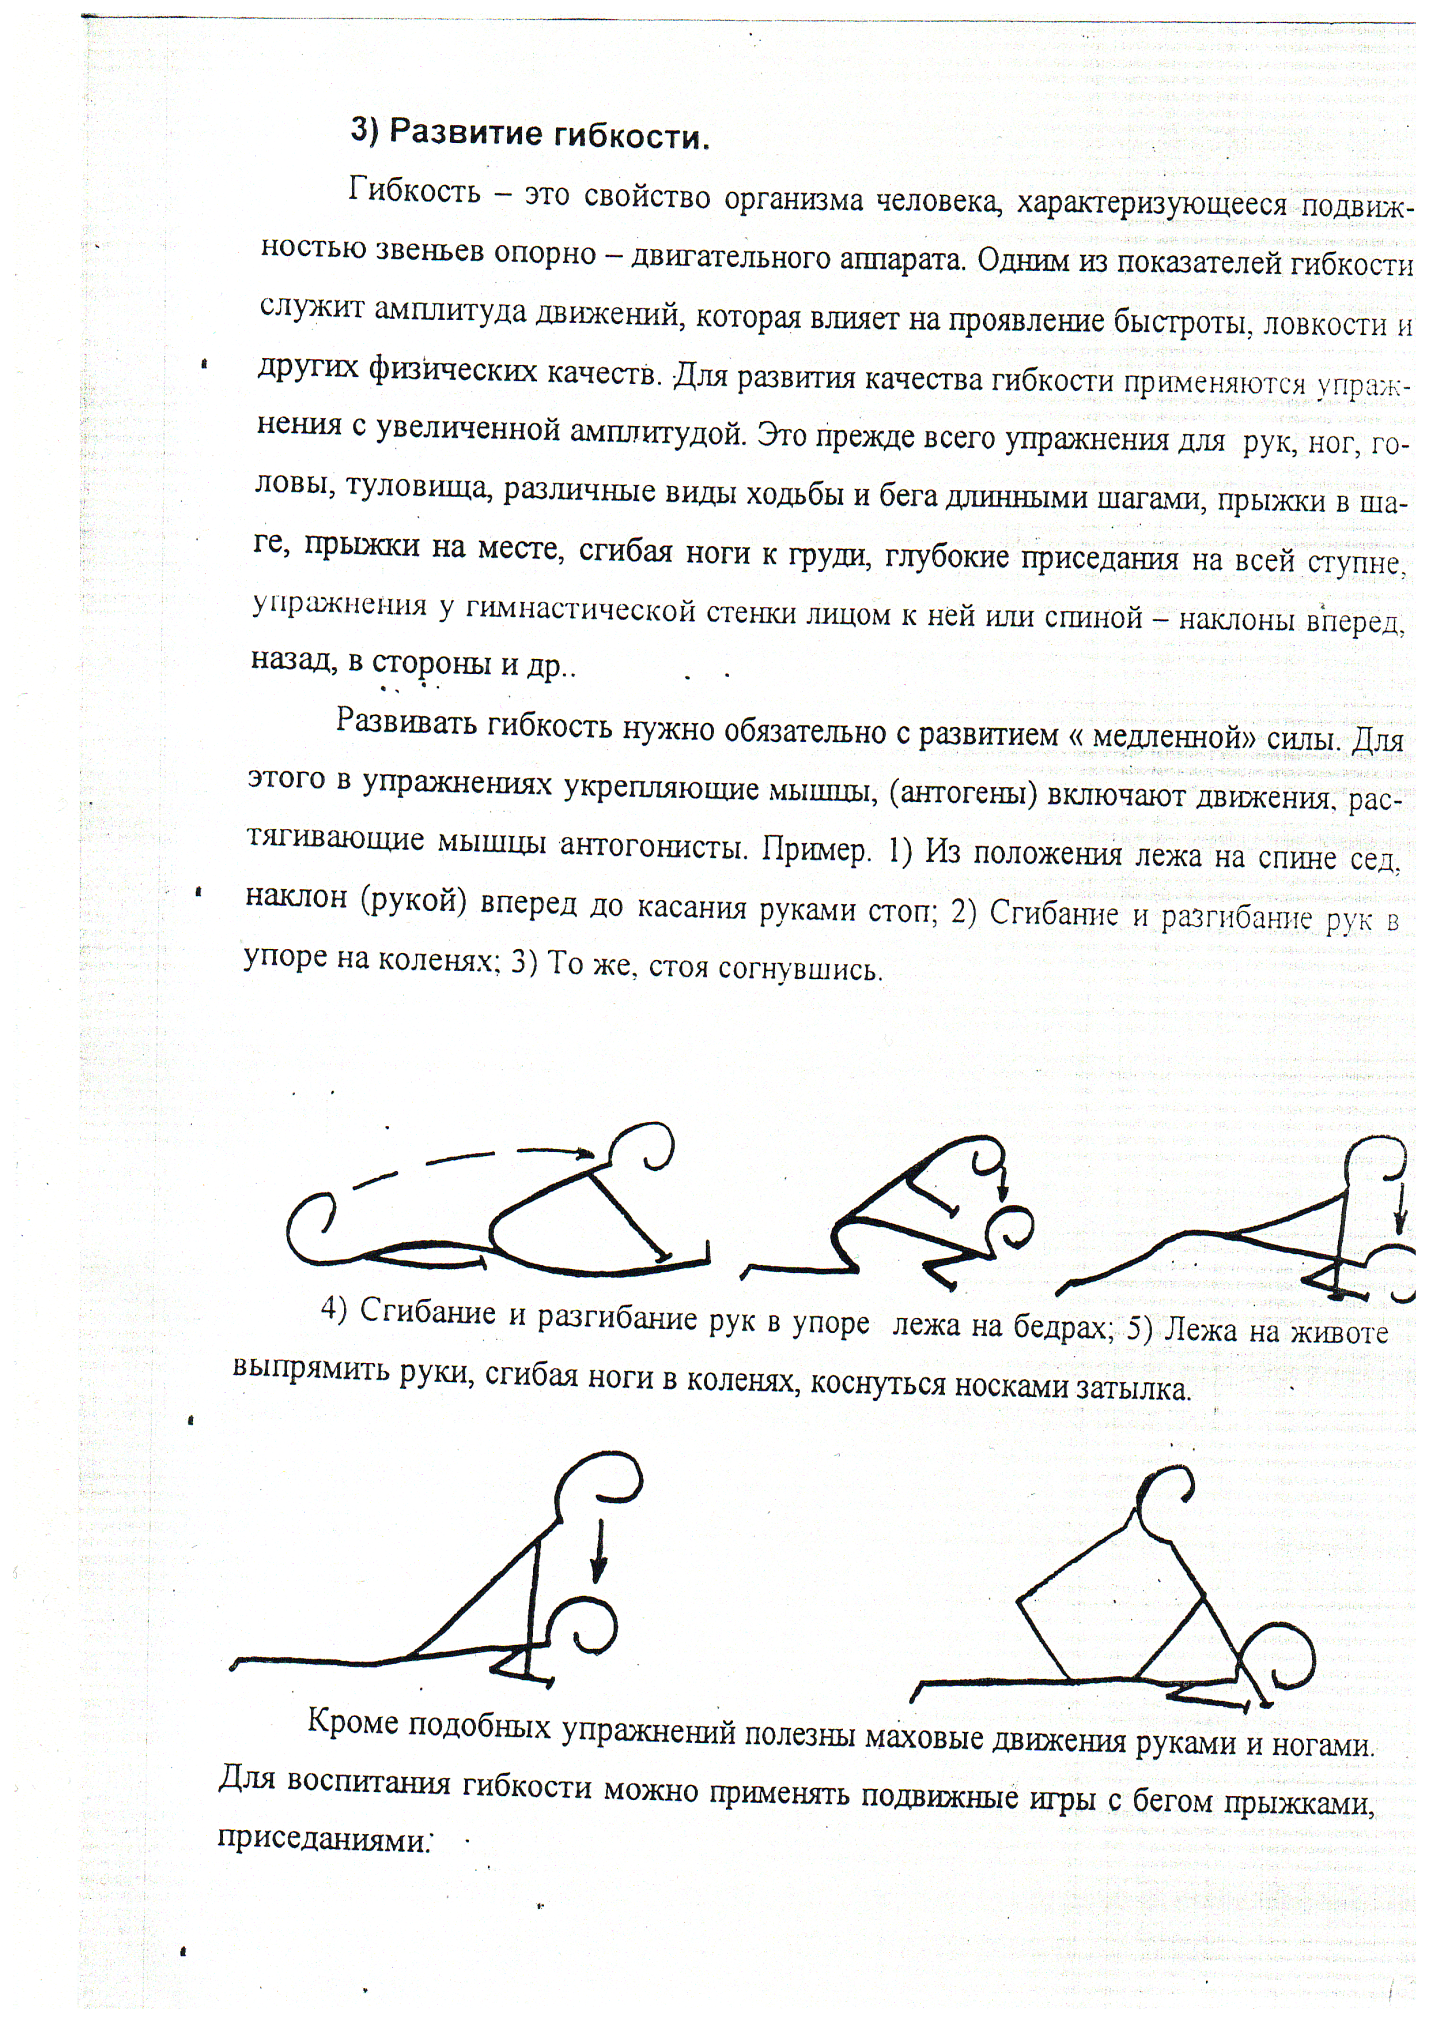 C:\Users\Татьяна\Desktop\13 001.BMP